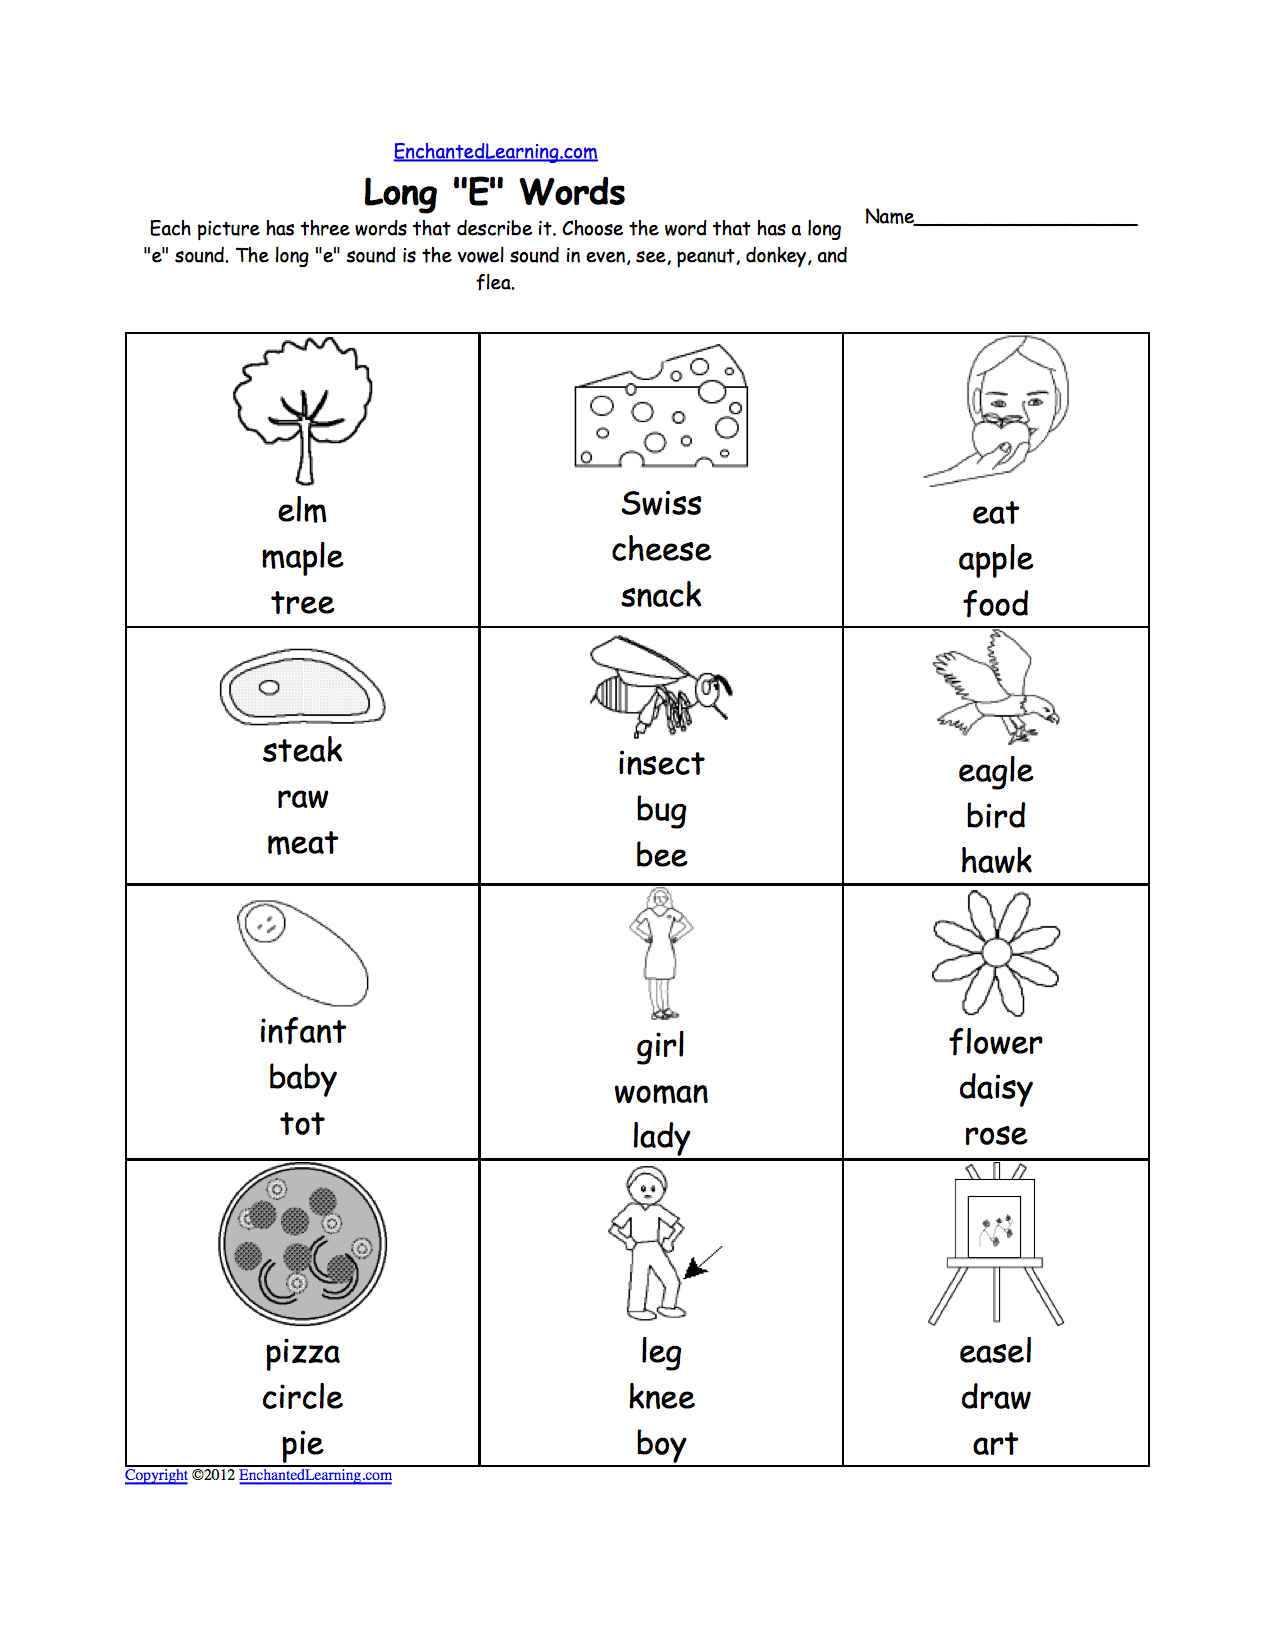 Worksheet For Kindergarten Reading About Long Vowel Sounds Google Search Vowel Sound Fun Worksheets For Kids Long E Words [ 1649 x 1275 Pixel ]